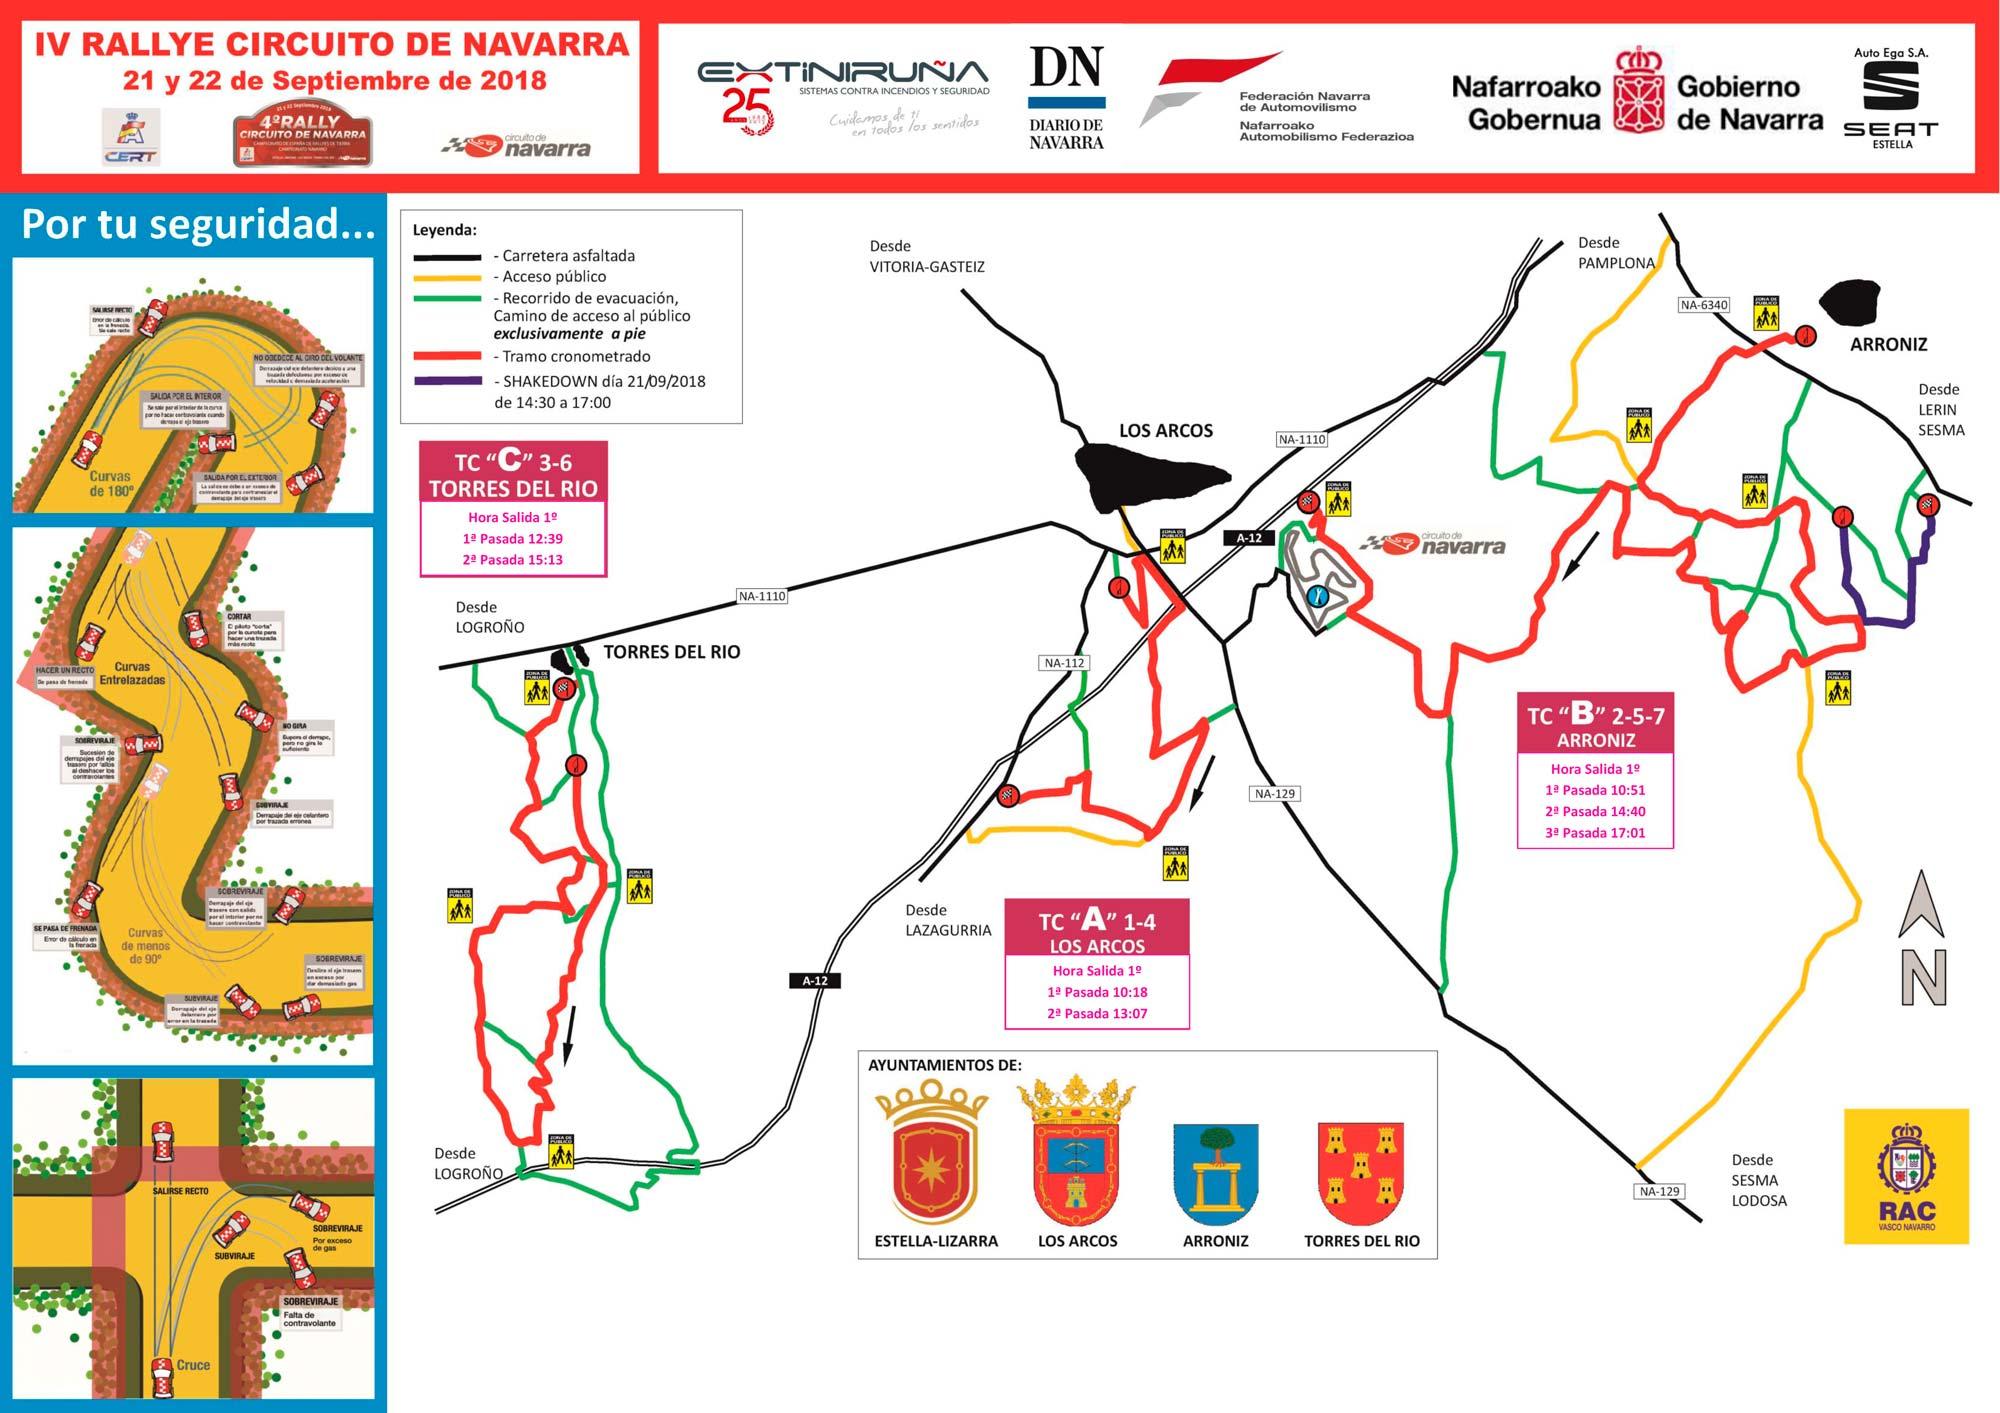 Circuito Navarra : Avance iv rally de tierra circuito de navarra federación